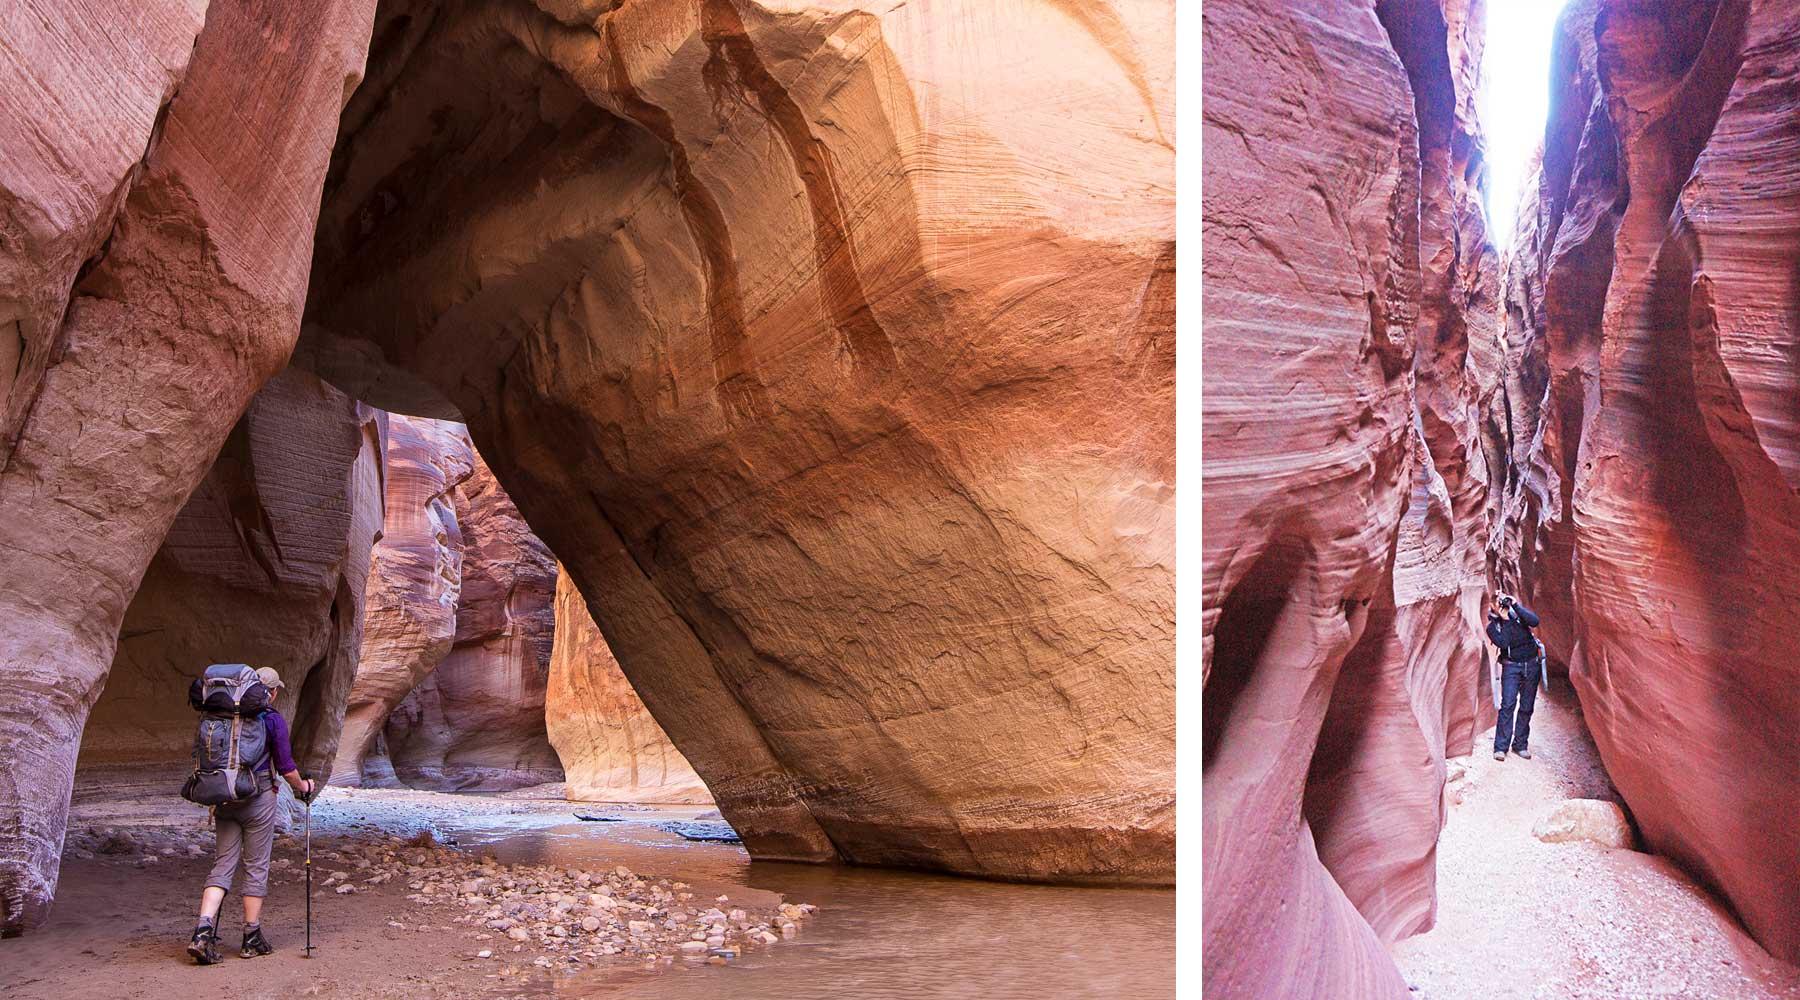 Bryce Canyon,  Buckskin Gulch, Les grands parcs de l'ouest en hiver, zion, grand canyon, bryce canyon, monument vallée, monument valley, las vegas, chinook voyage, aventure, randonnée